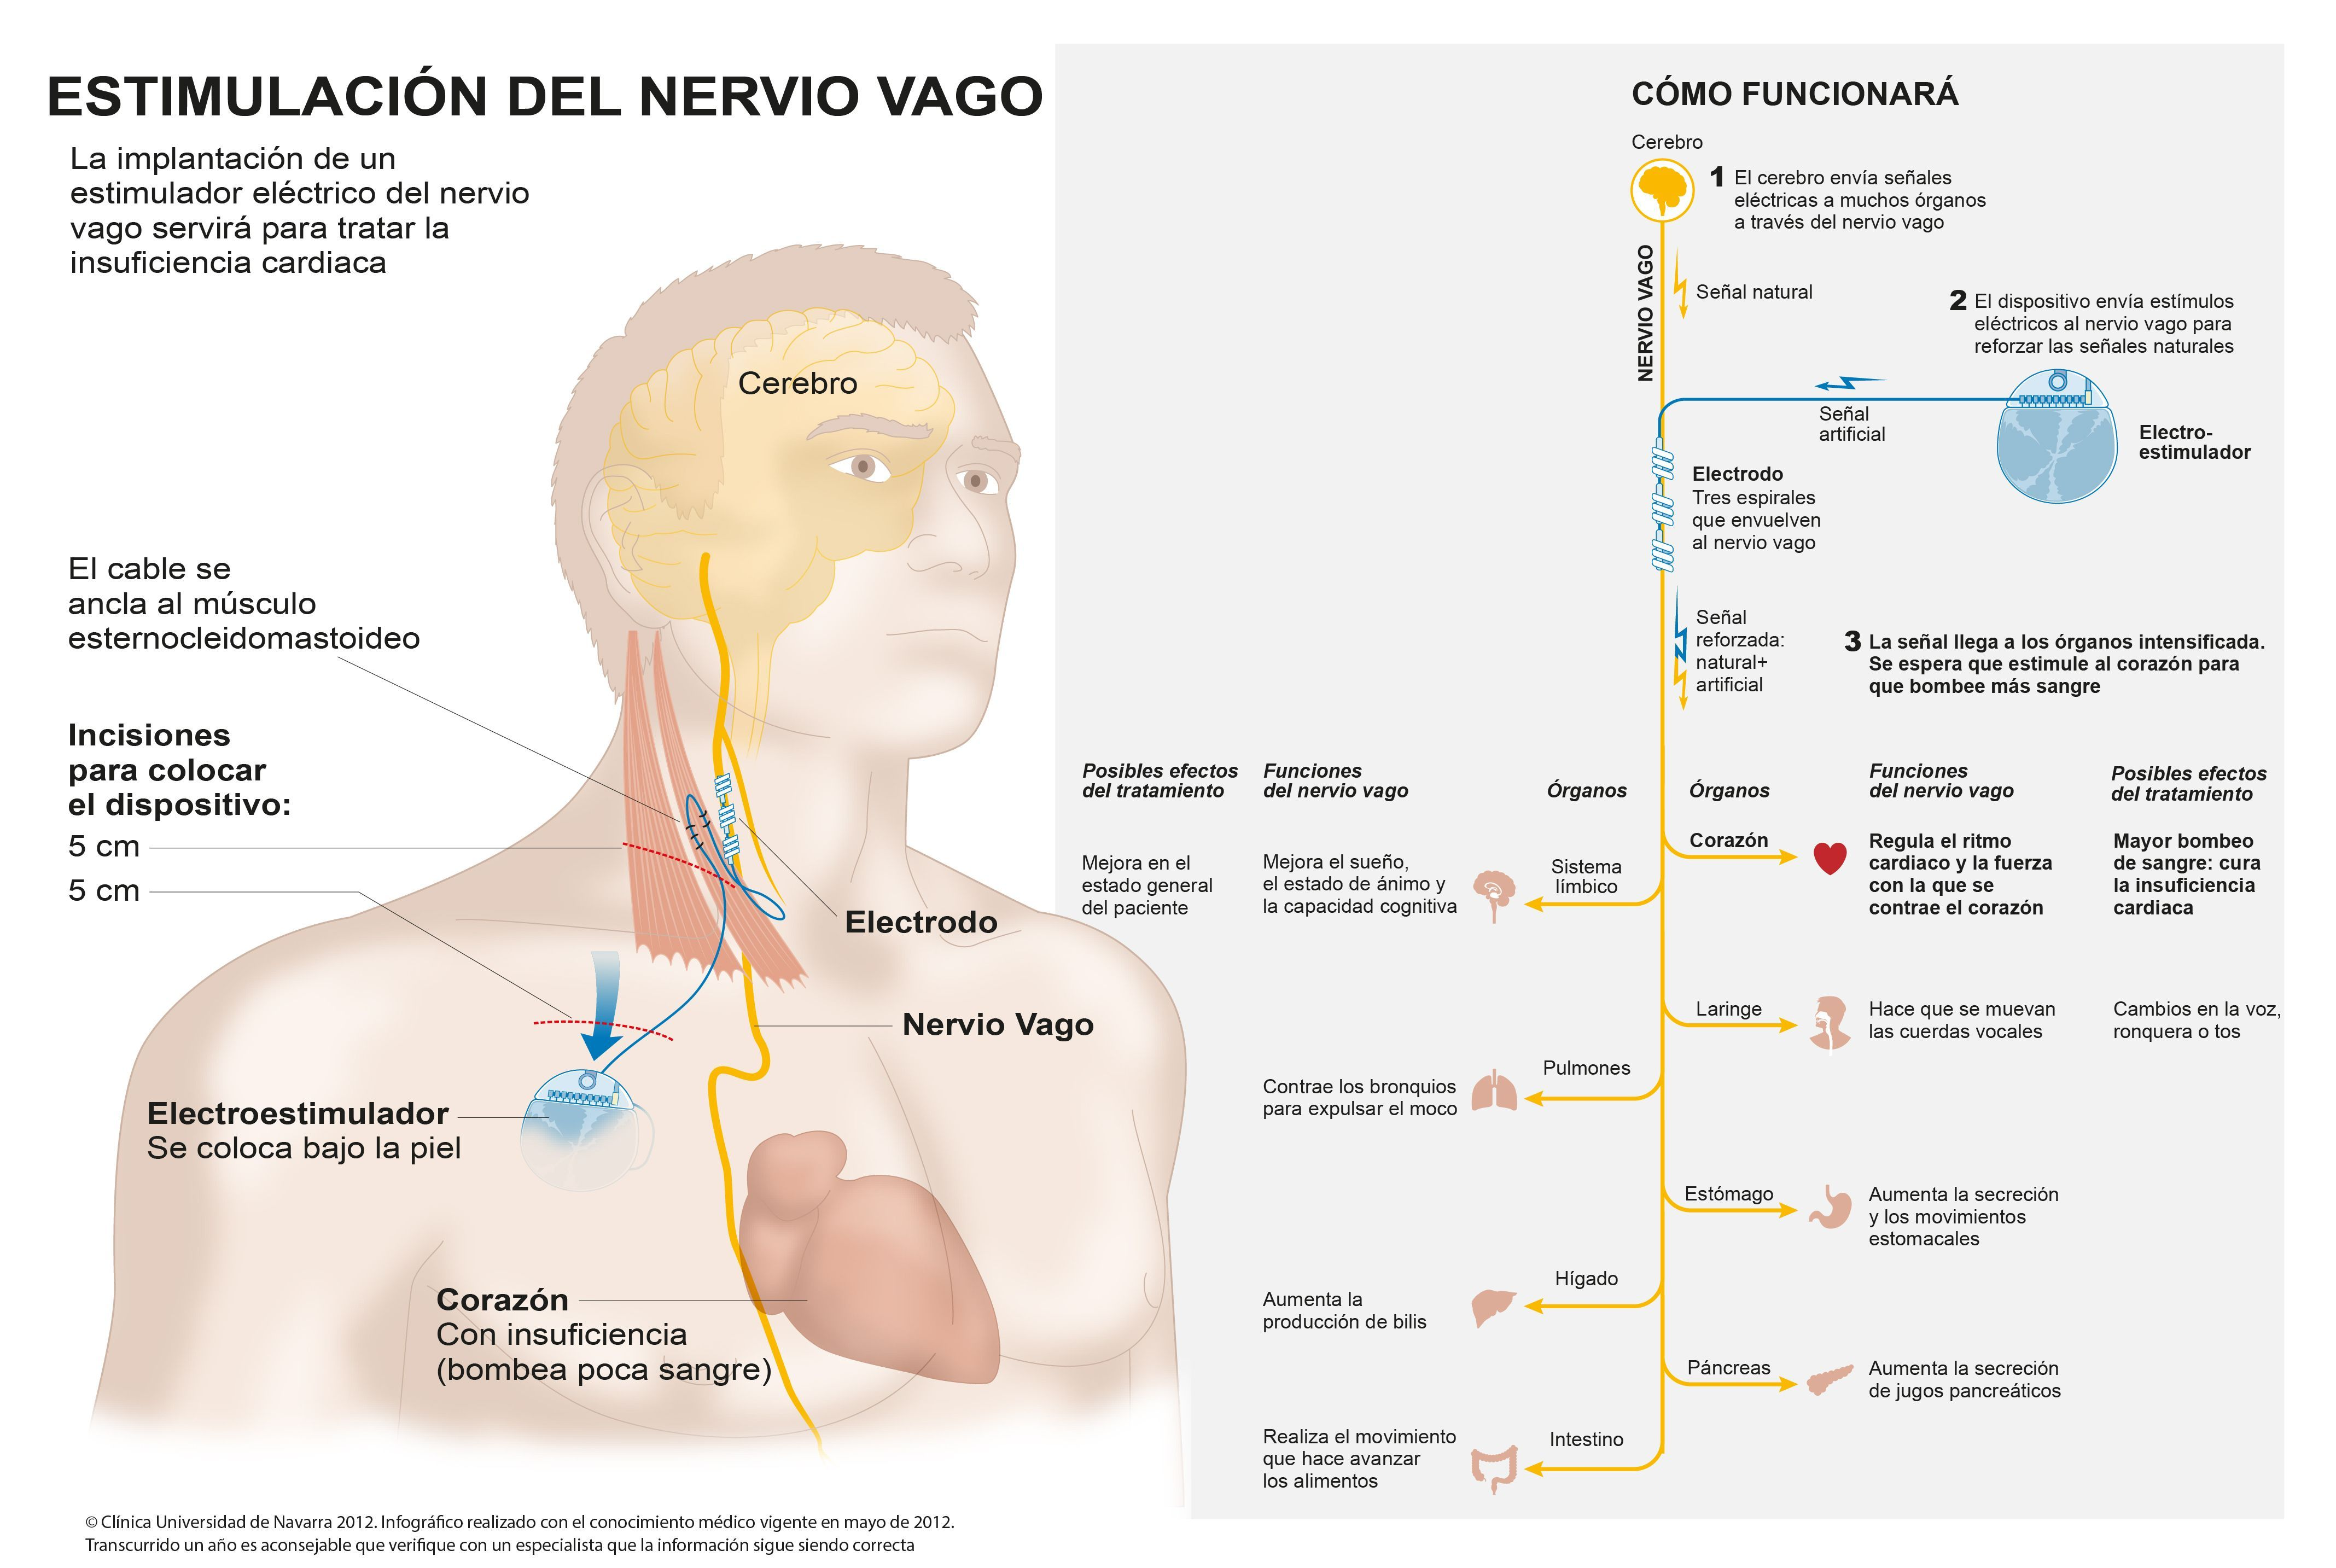 https://www.google.com.ar/search?q=estimulacion nervio vago para ...